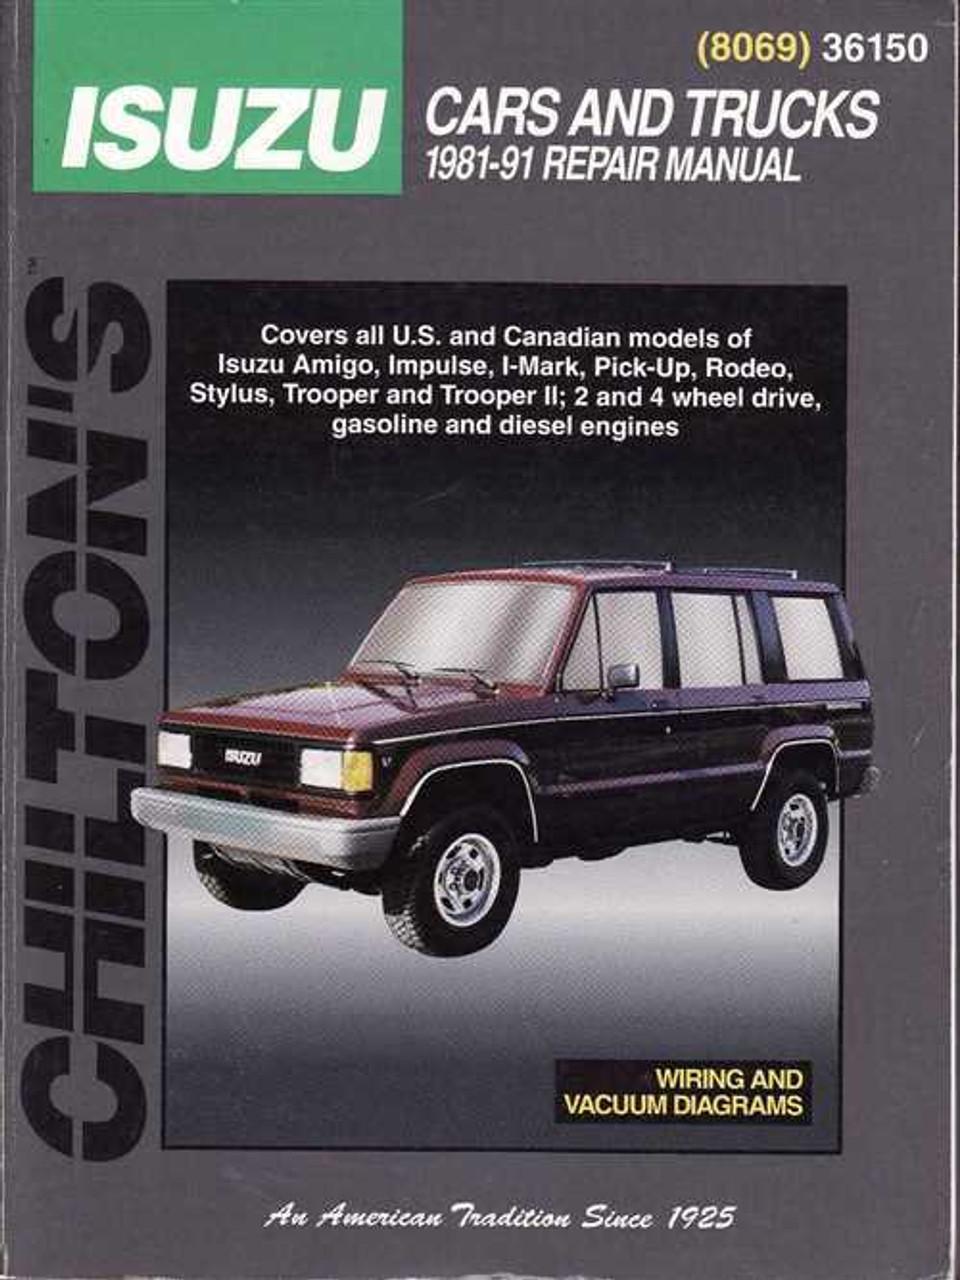 car workshop manuals holden jackaroo rh car workshop manuals holden jackaroo tempower us isuzu bighorn owners manual 1996 isuzu bighorn owners manual